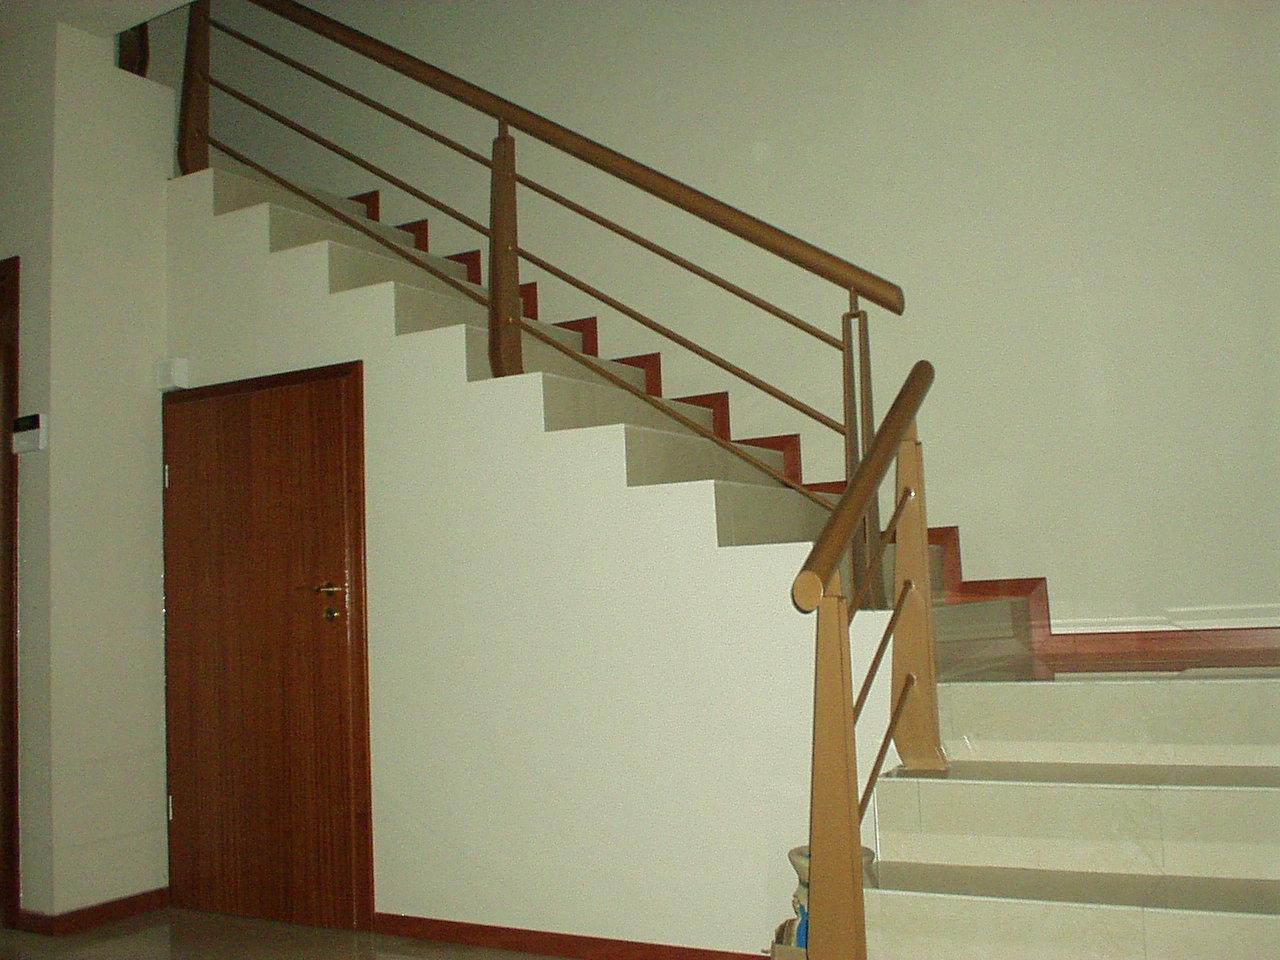 Barandales de forja related keywords barandales de forja - Barandales para escaleras ...